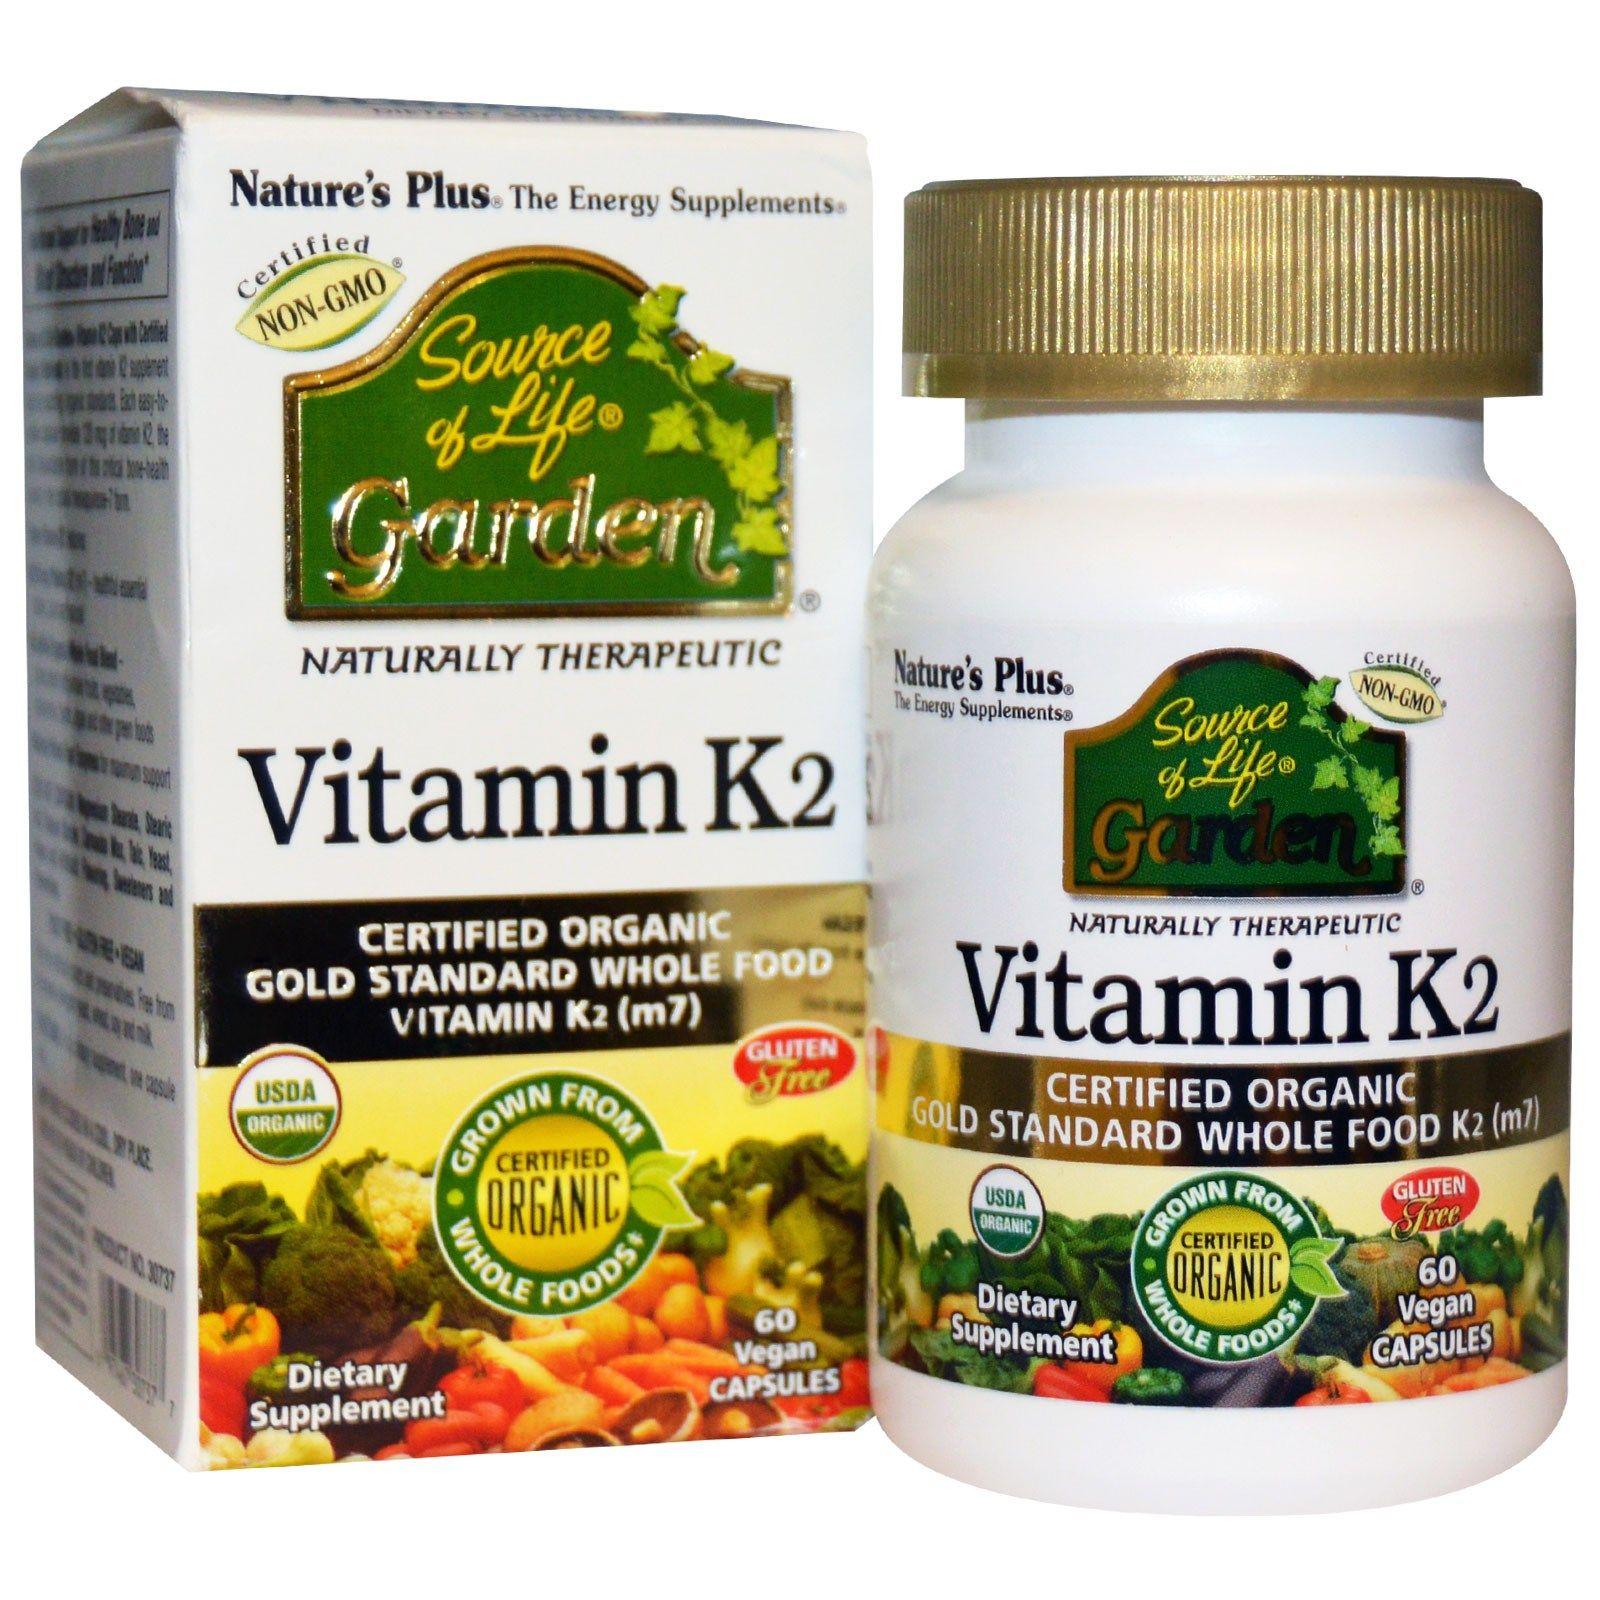 Source of Life Garden Vegan Power Meal Bio, 645 g - Nature